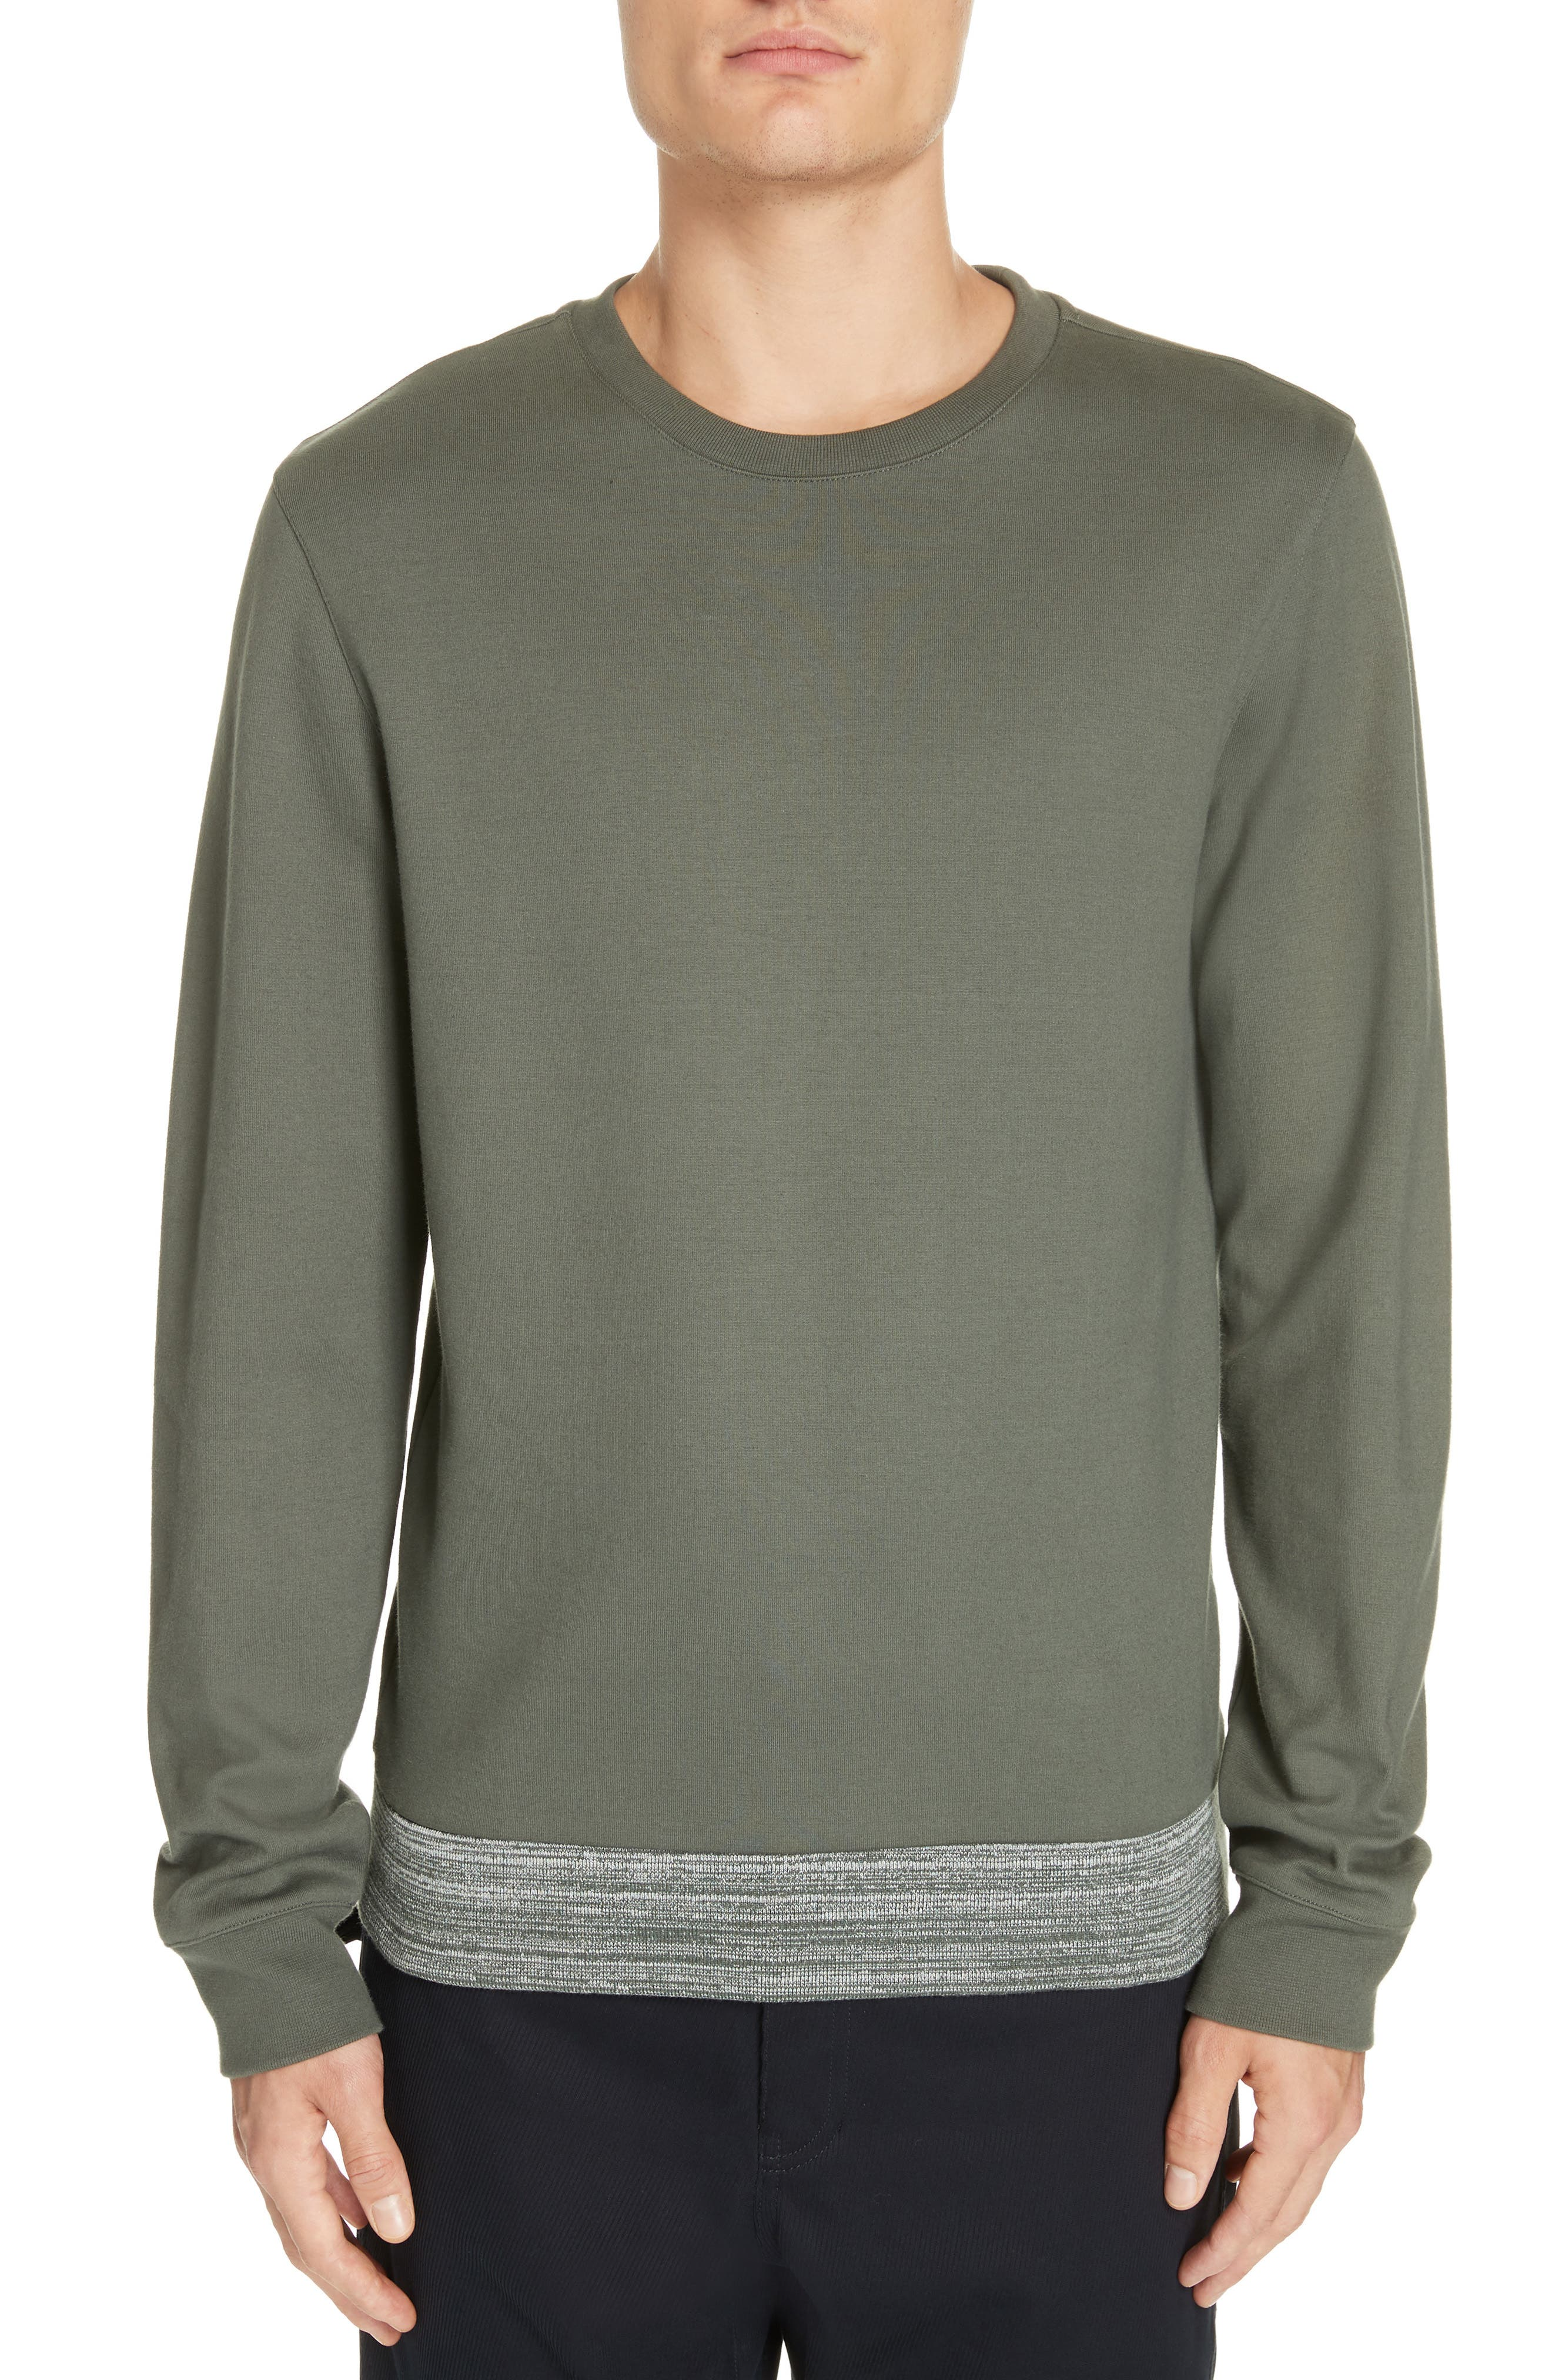 Jeremie Space Dye Sweatshirt,                             Main thumbnail 1, color,                             KHAKI